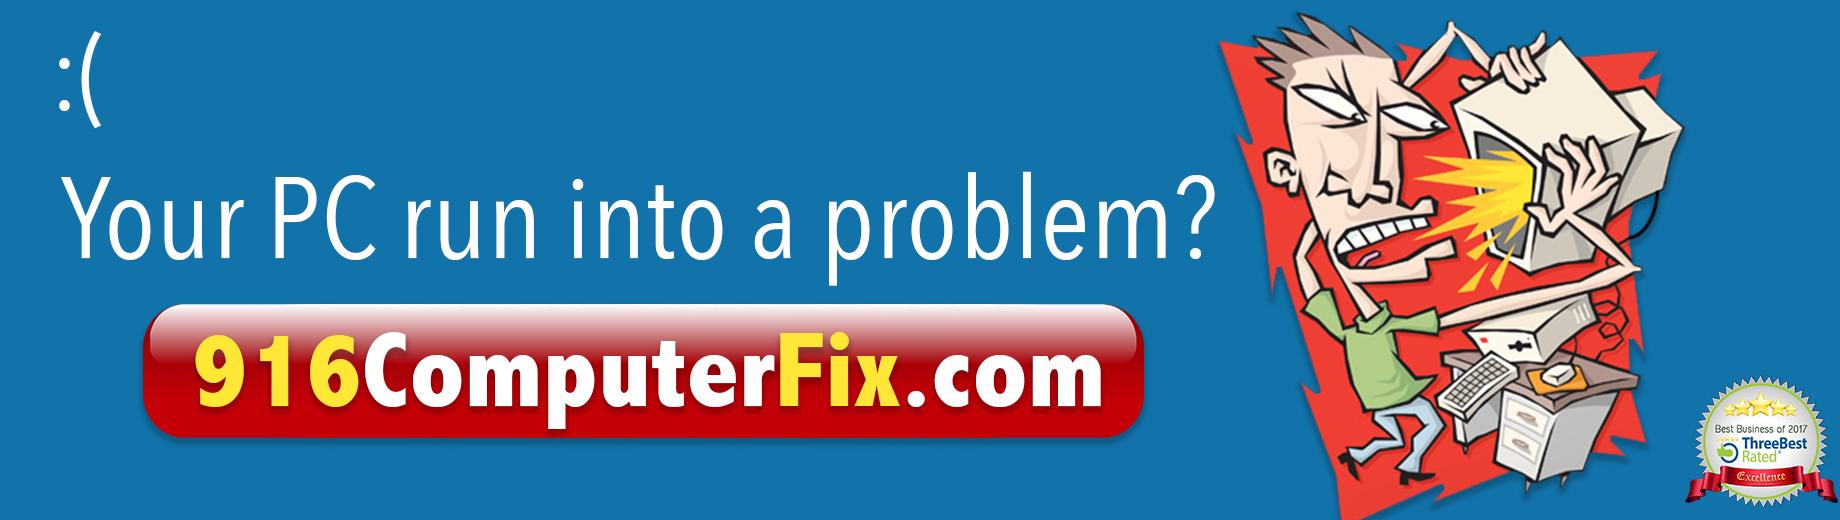 916ComputerFix.com-1.jpg